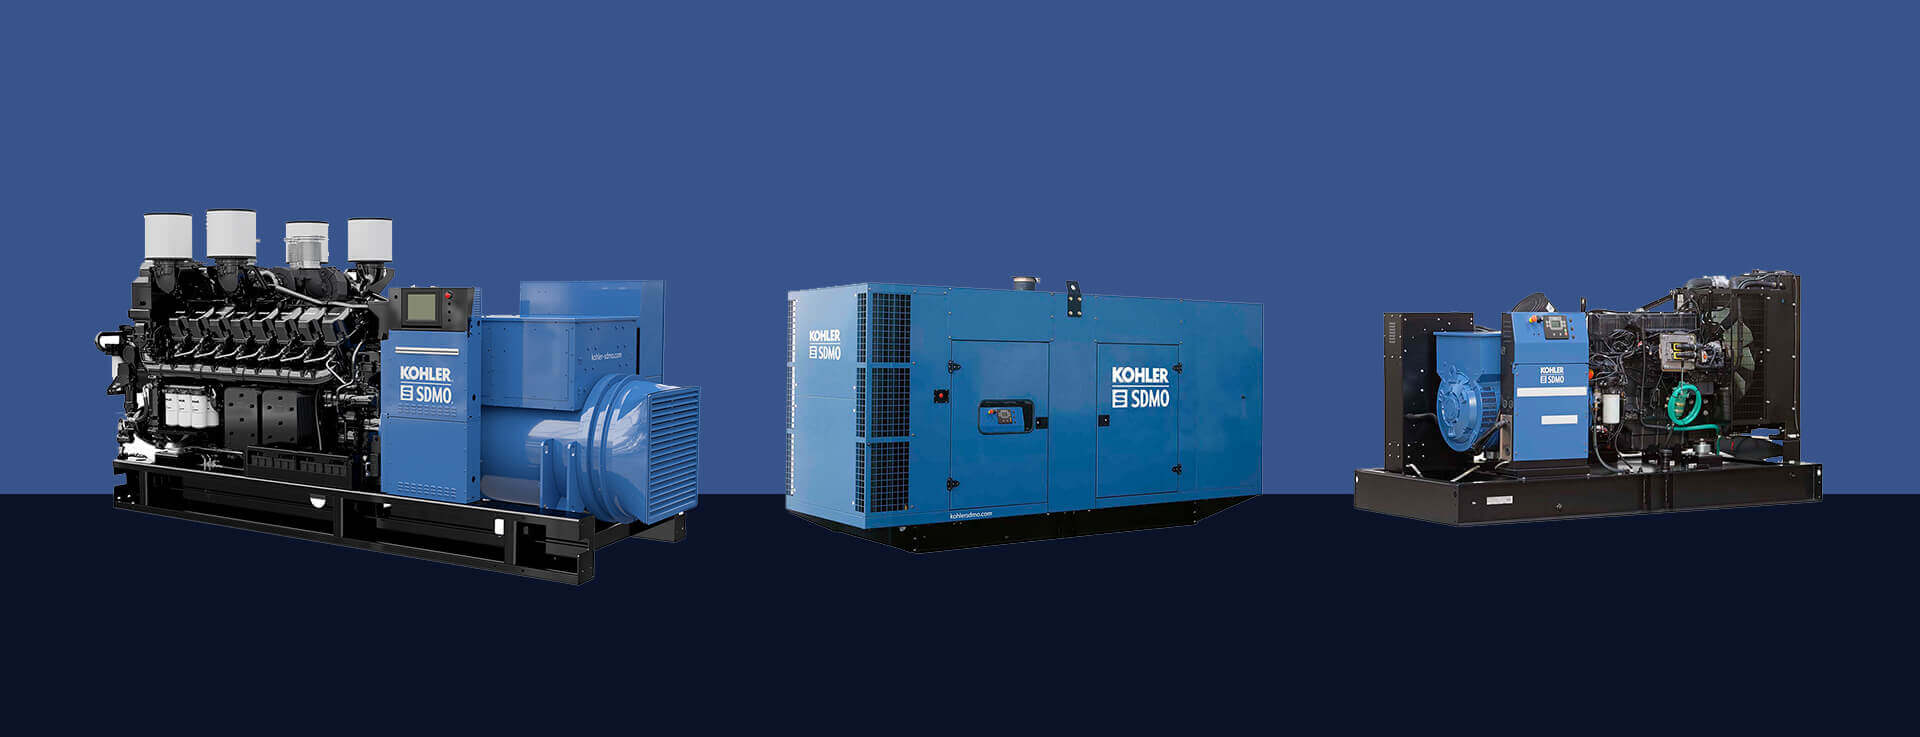 Three Kohler-SDMO Industrial Generators